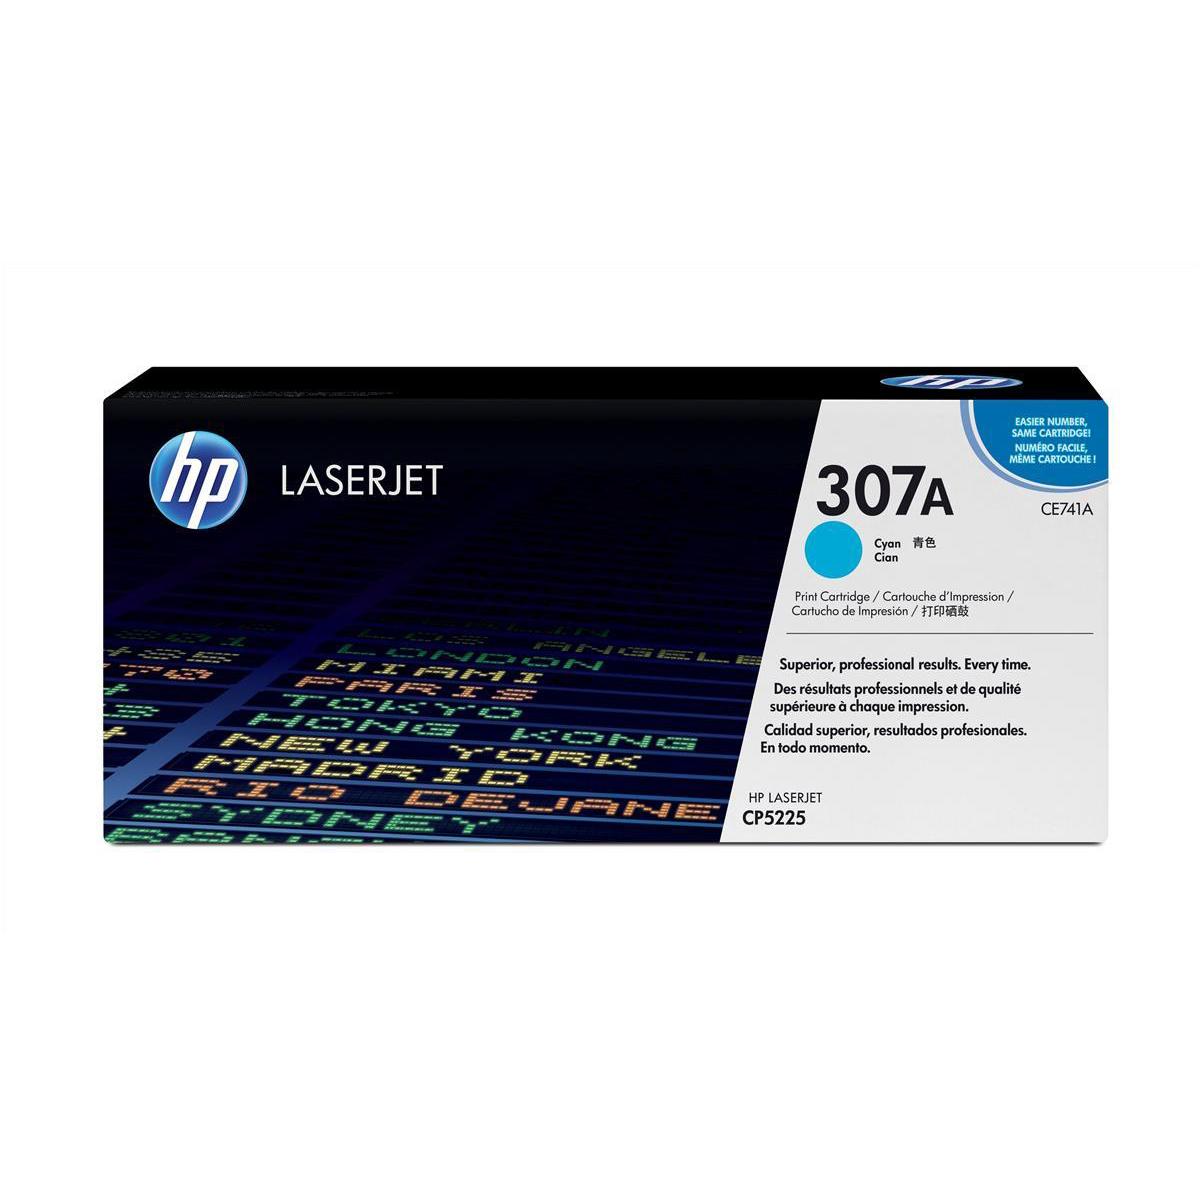 Hewlett Packard [HP] No. 307A Laser Toner Cartridge Page Life 7300pp Cyan Ref CE741A